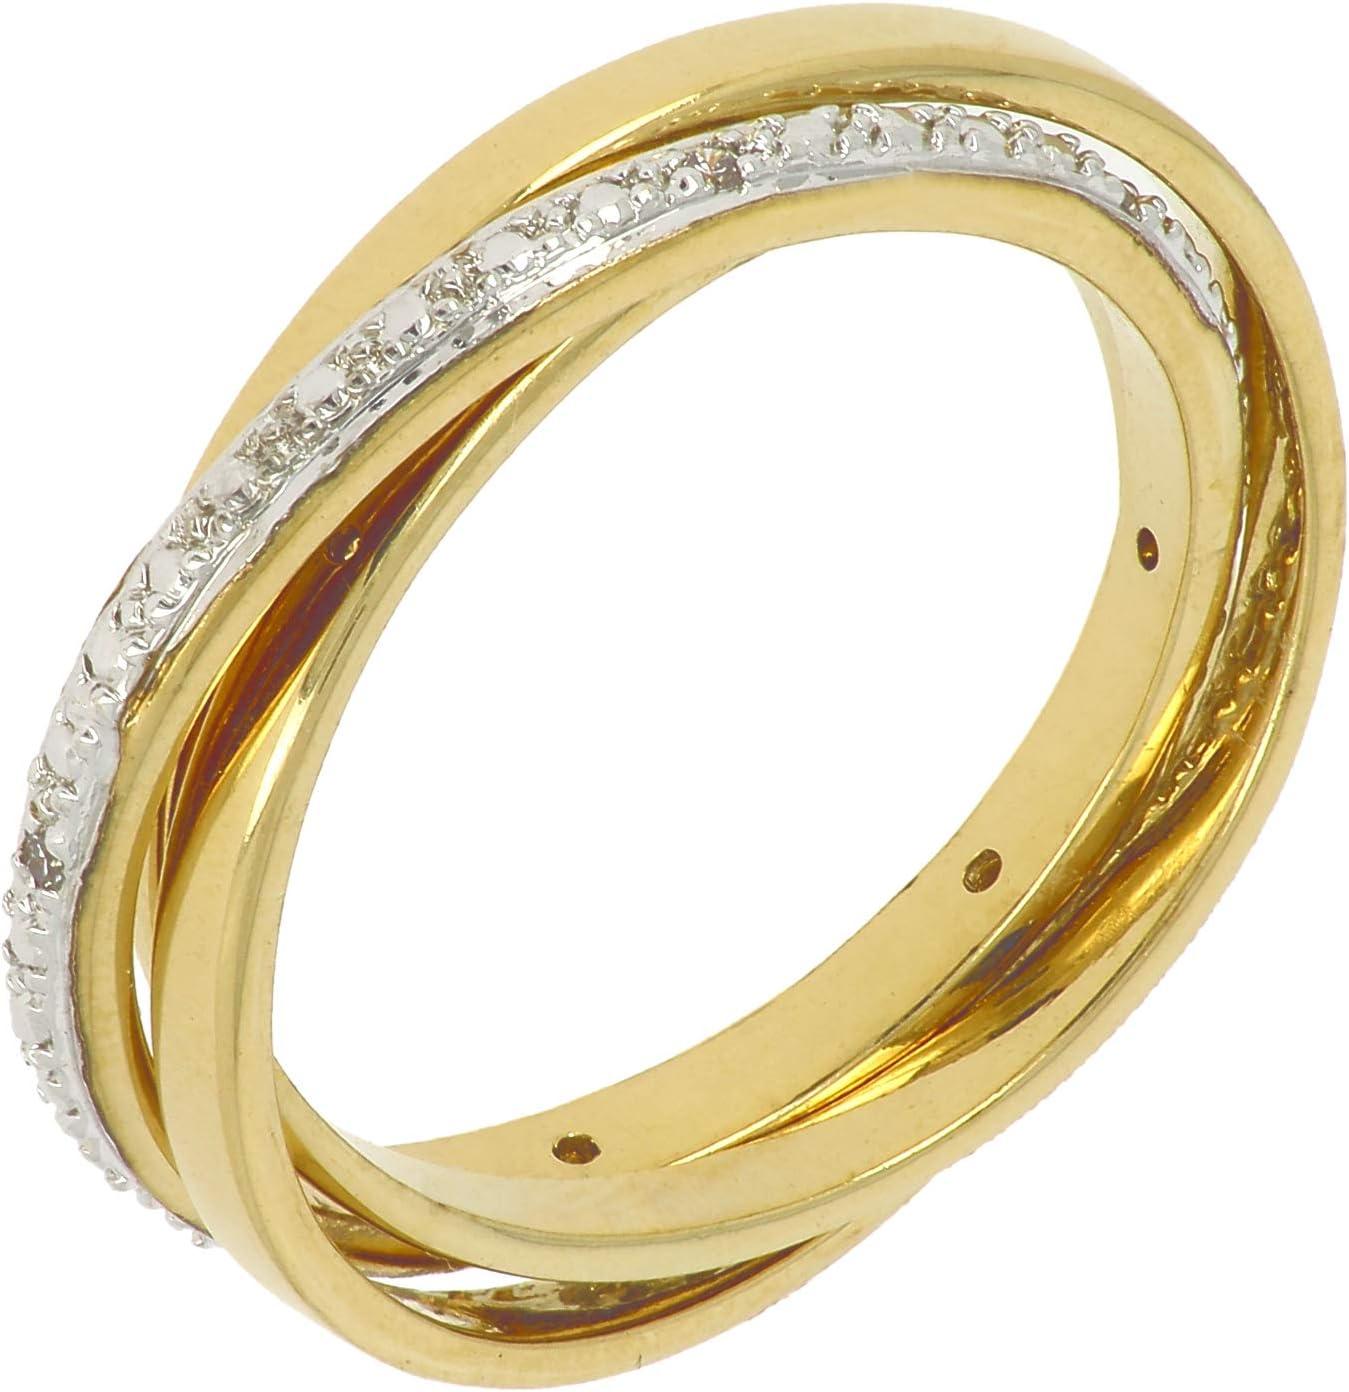 ISADY Lilo Gold Damen Ring 18 Karat Gelbgold: Amazon